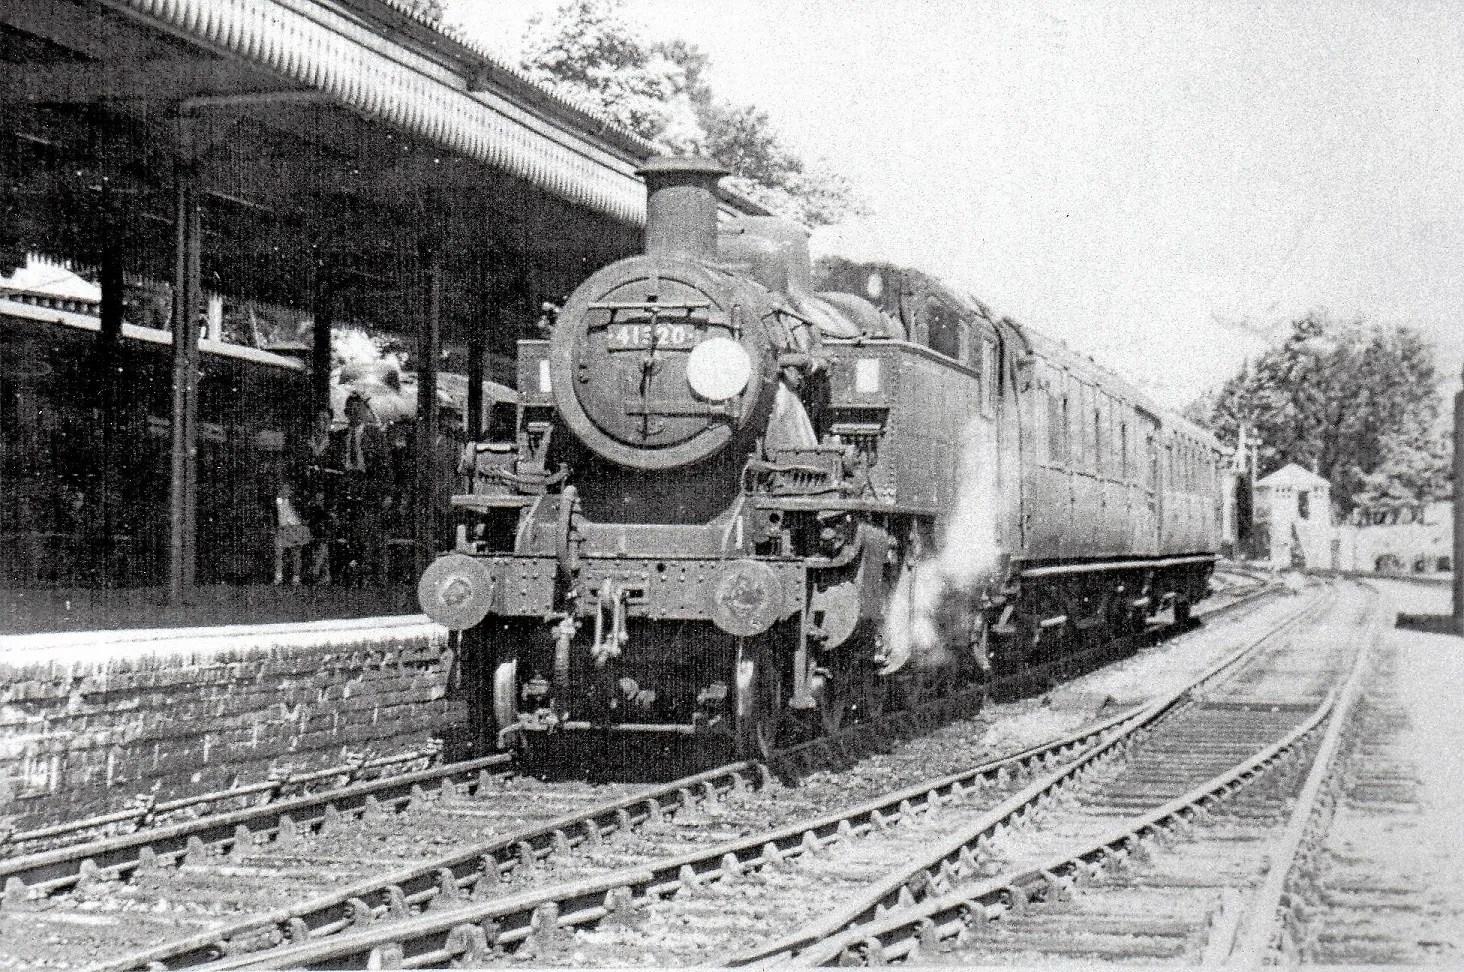 Ivatt Class 2 locomotive - 41320 - Sidmouth Railway Station